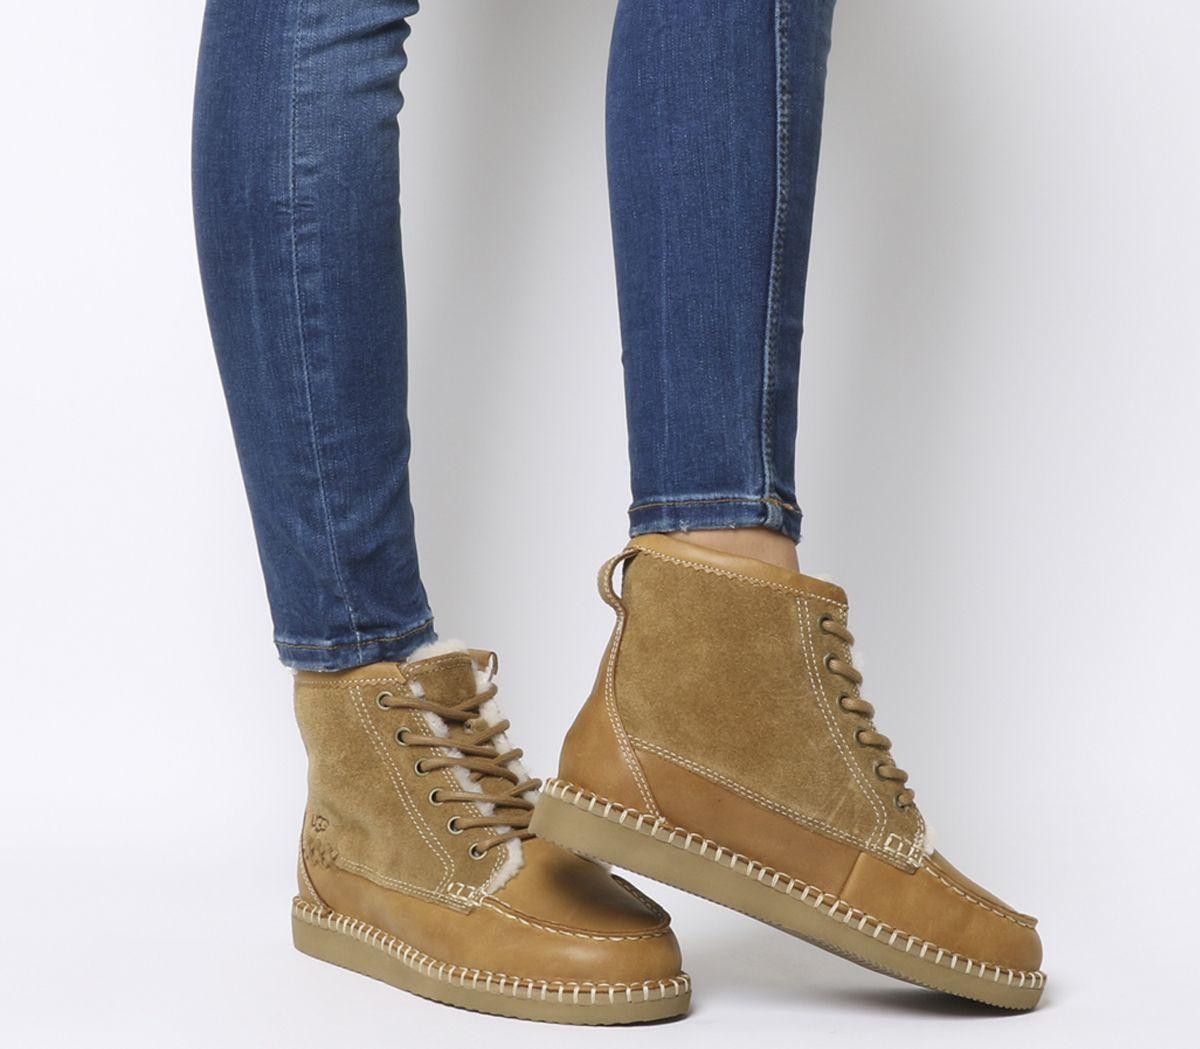 dc320892a09 Quinlin Lace Up Boots